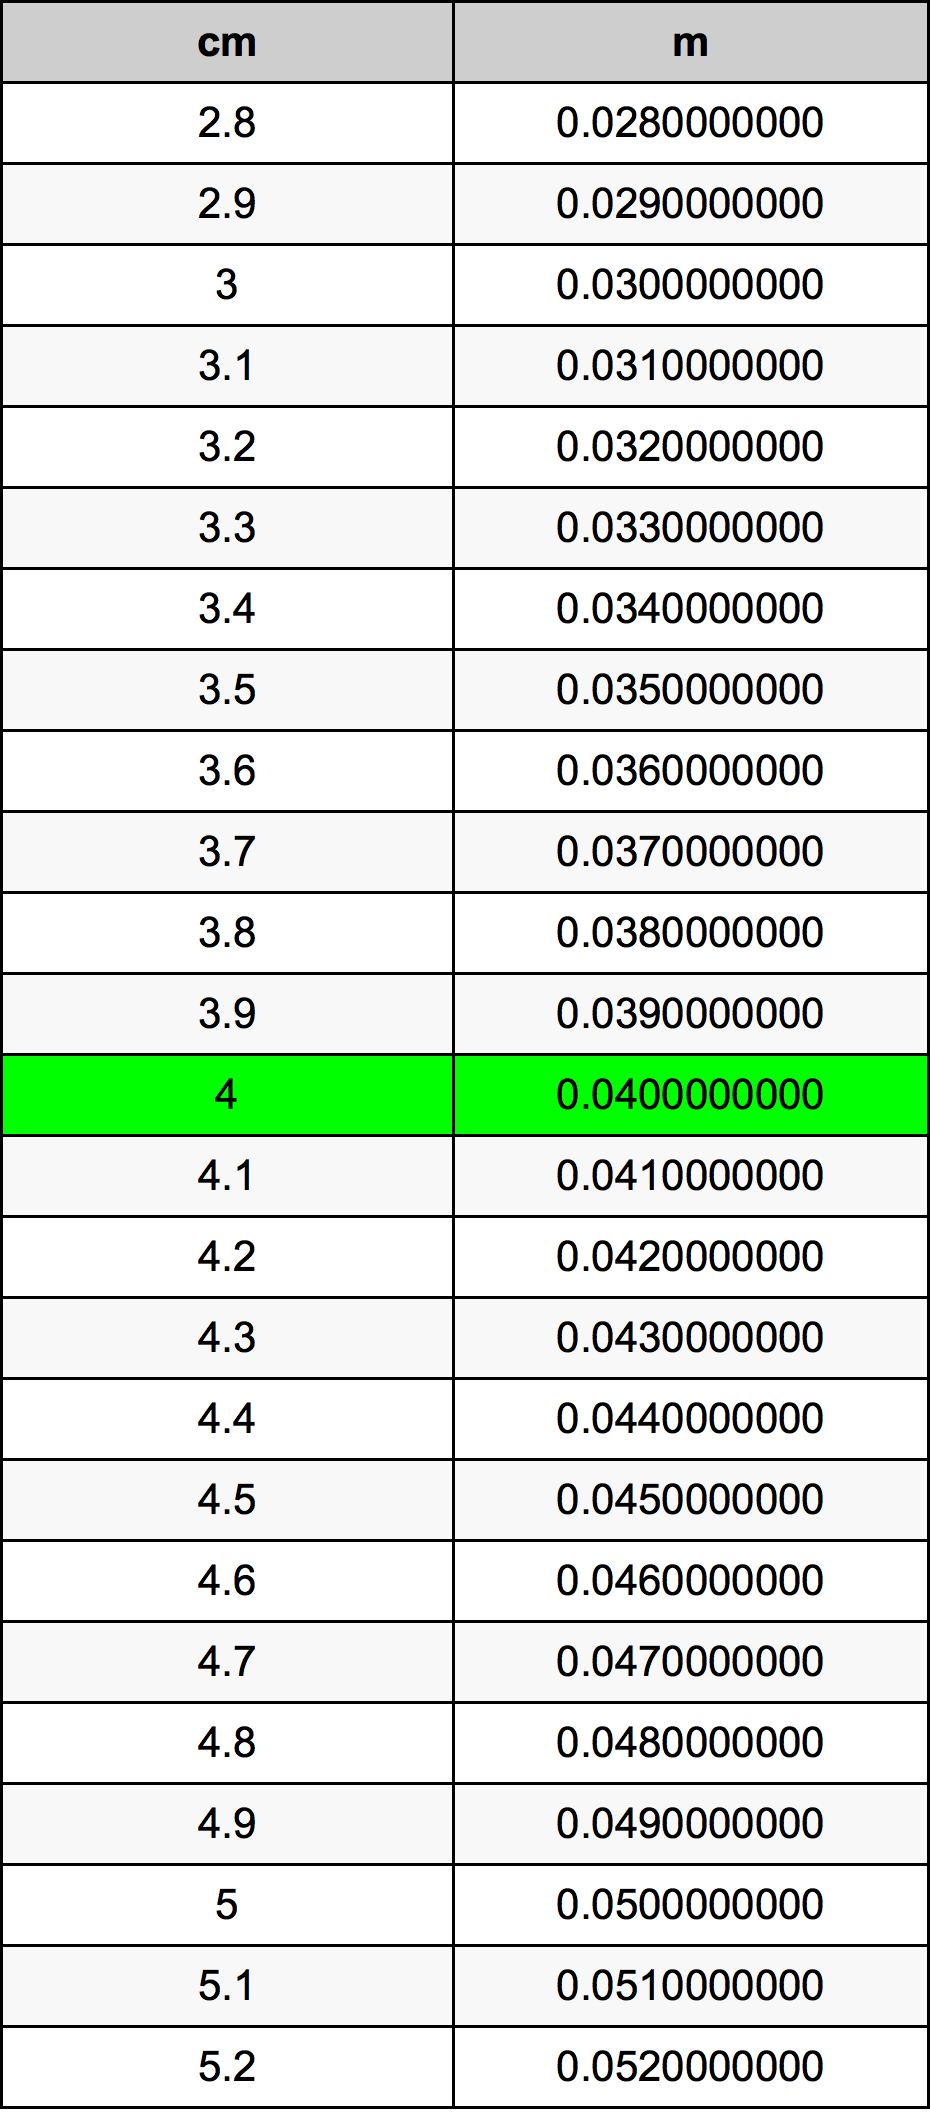 Cm 4 To M 4 : Centimeters, Meters, Converter